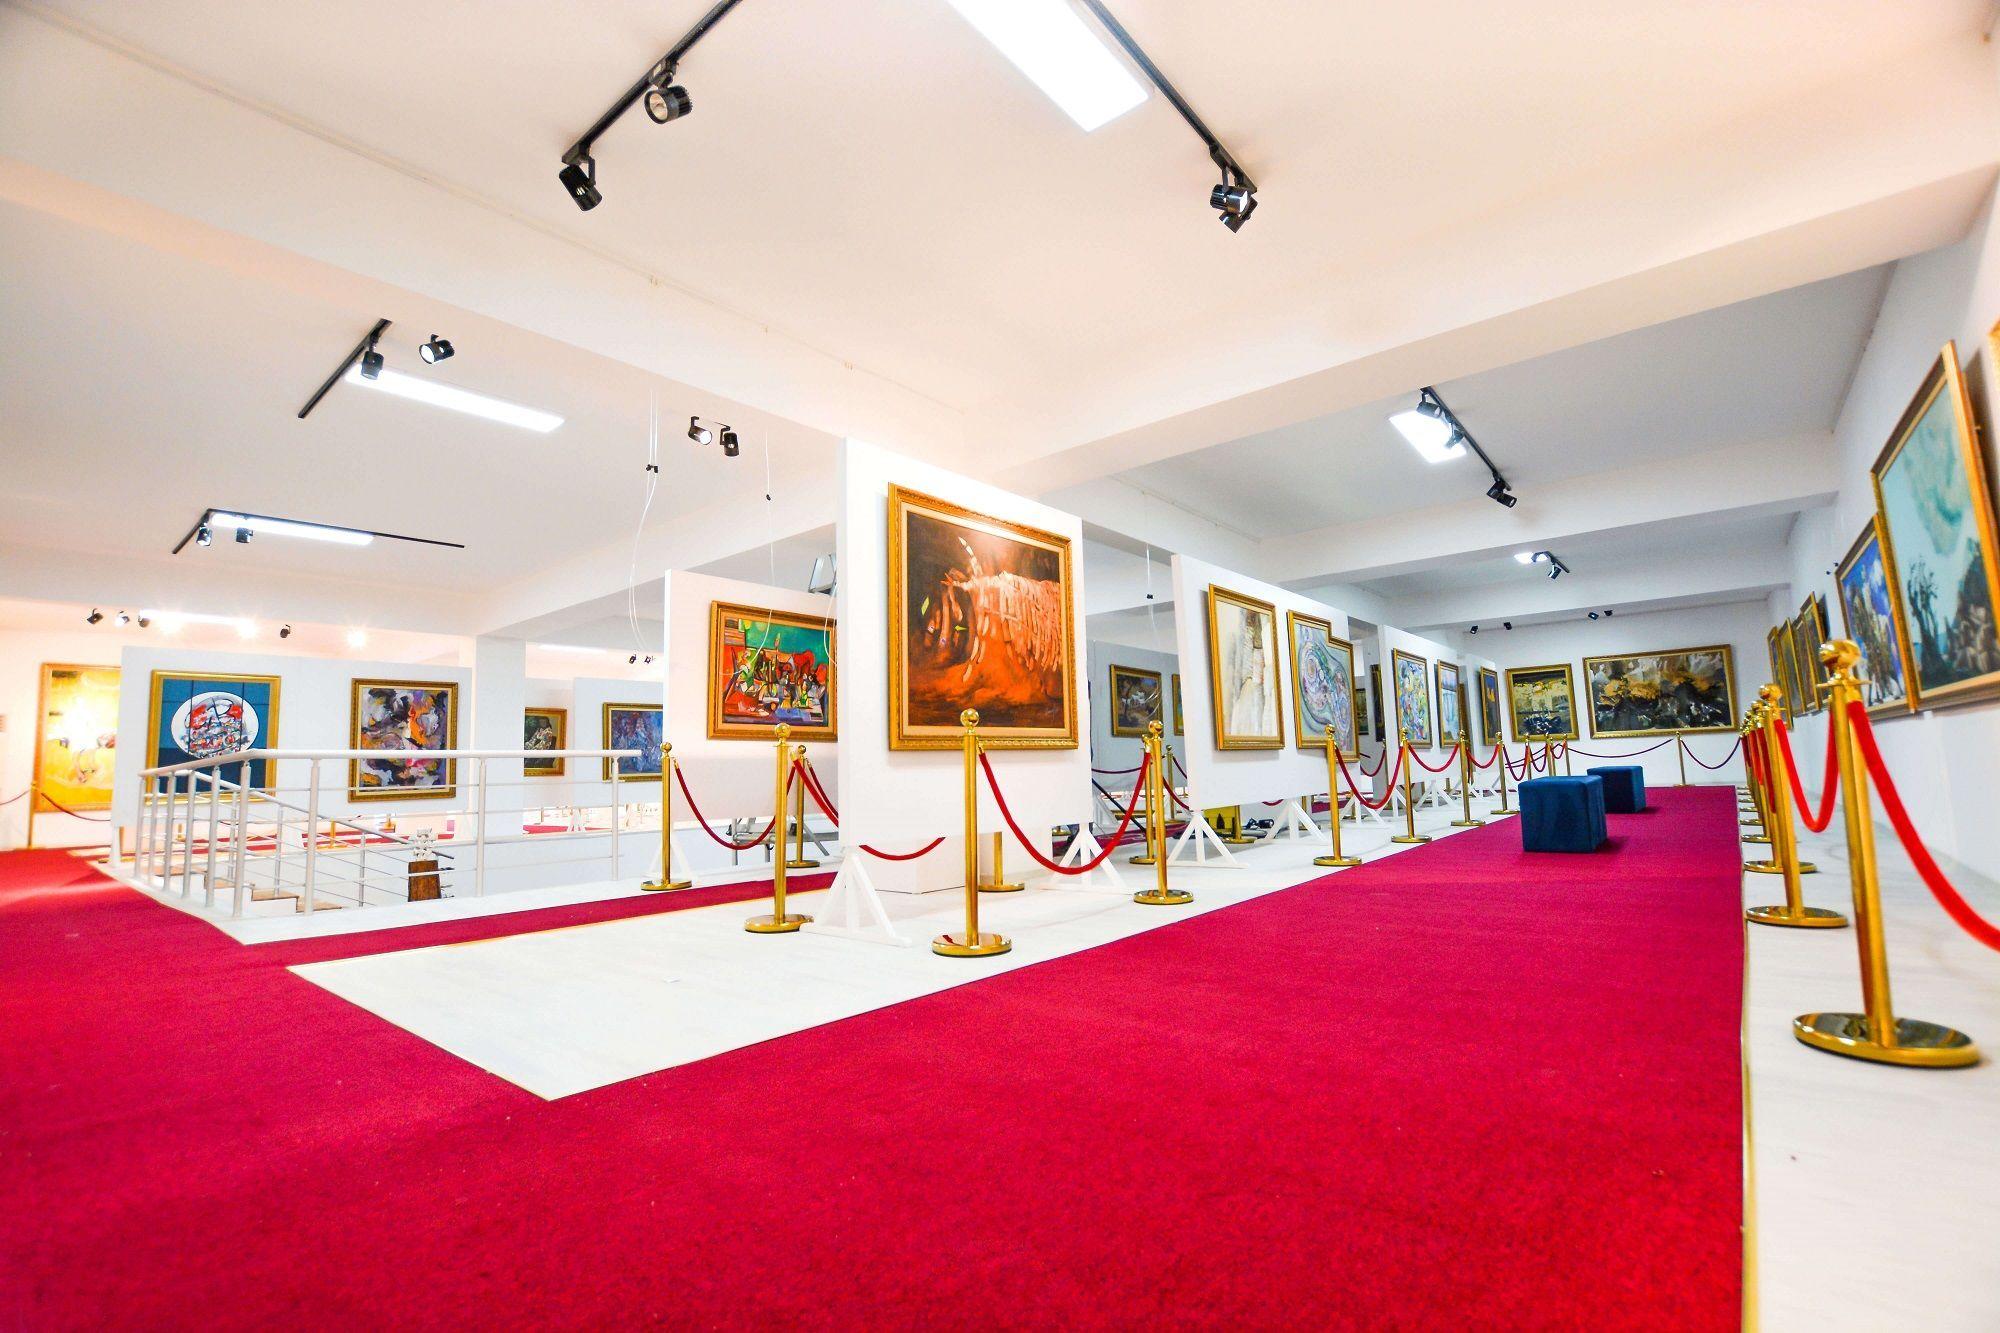 Музеи Near East ждут своих любителей искусства